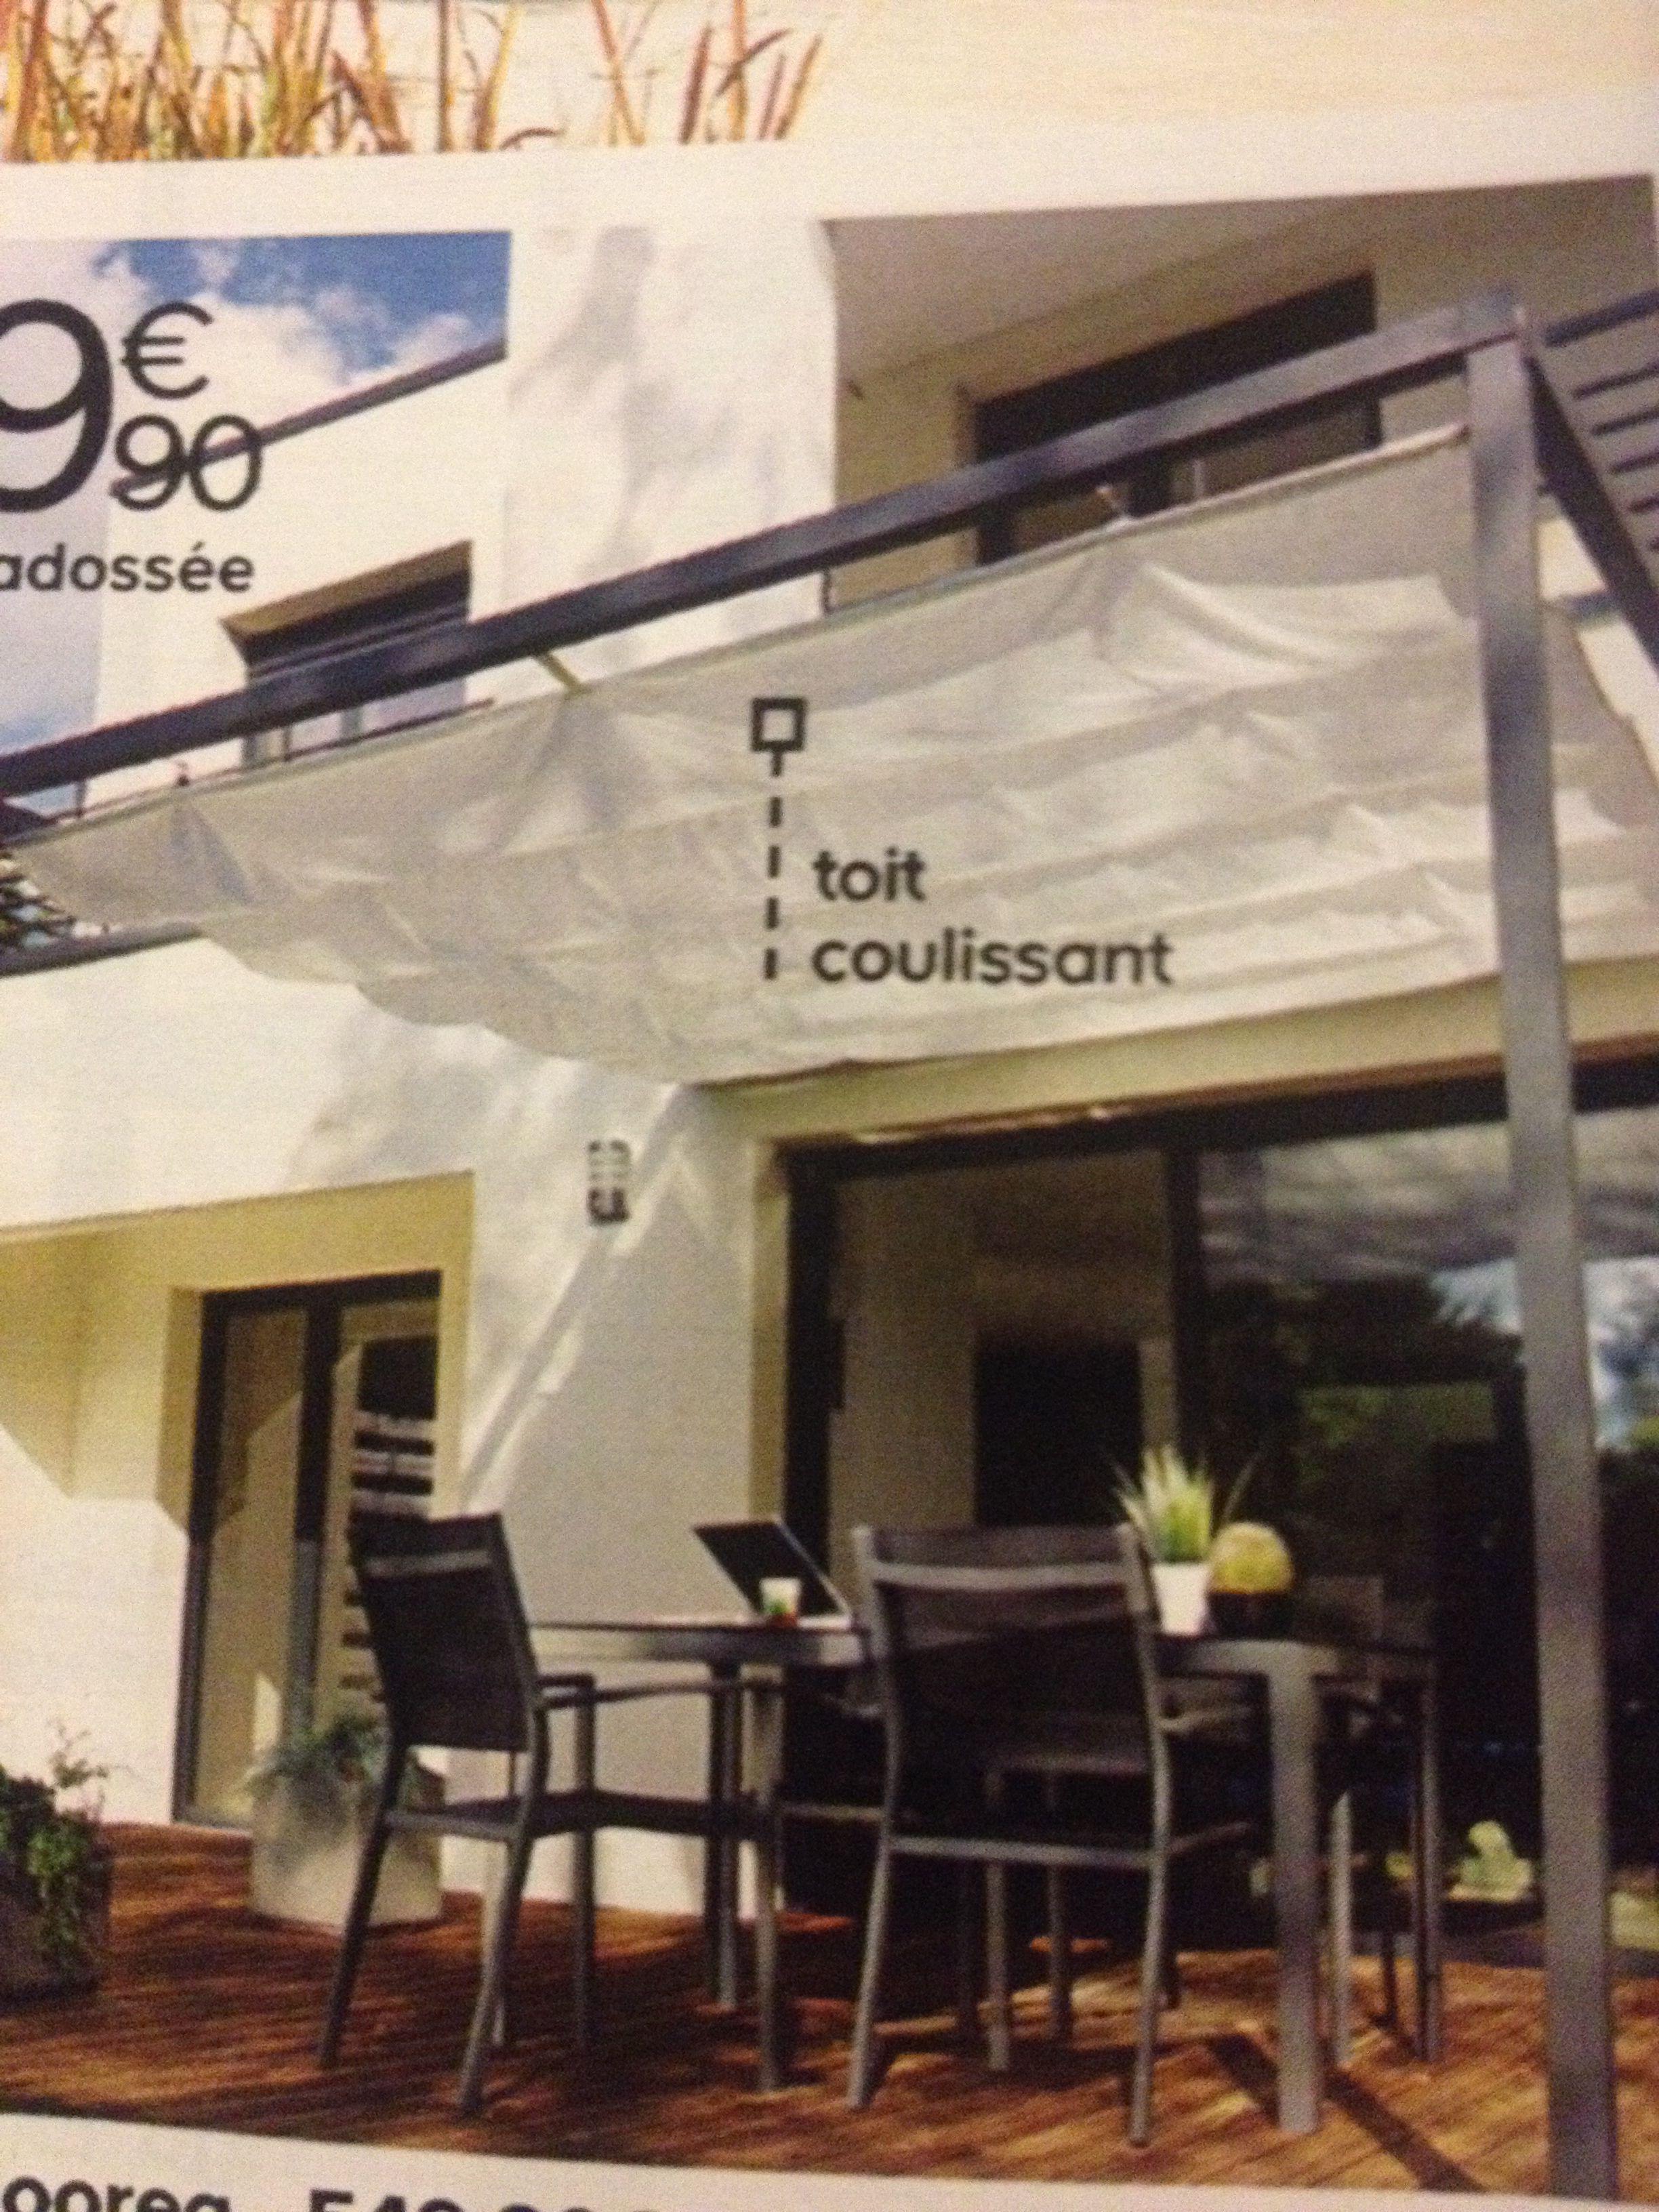 tonnelle adoss e 300 chez castorama veranda tonnelle adoss e castorama et maison. Black Bedroom Furniture Sets. Home Design Ideas